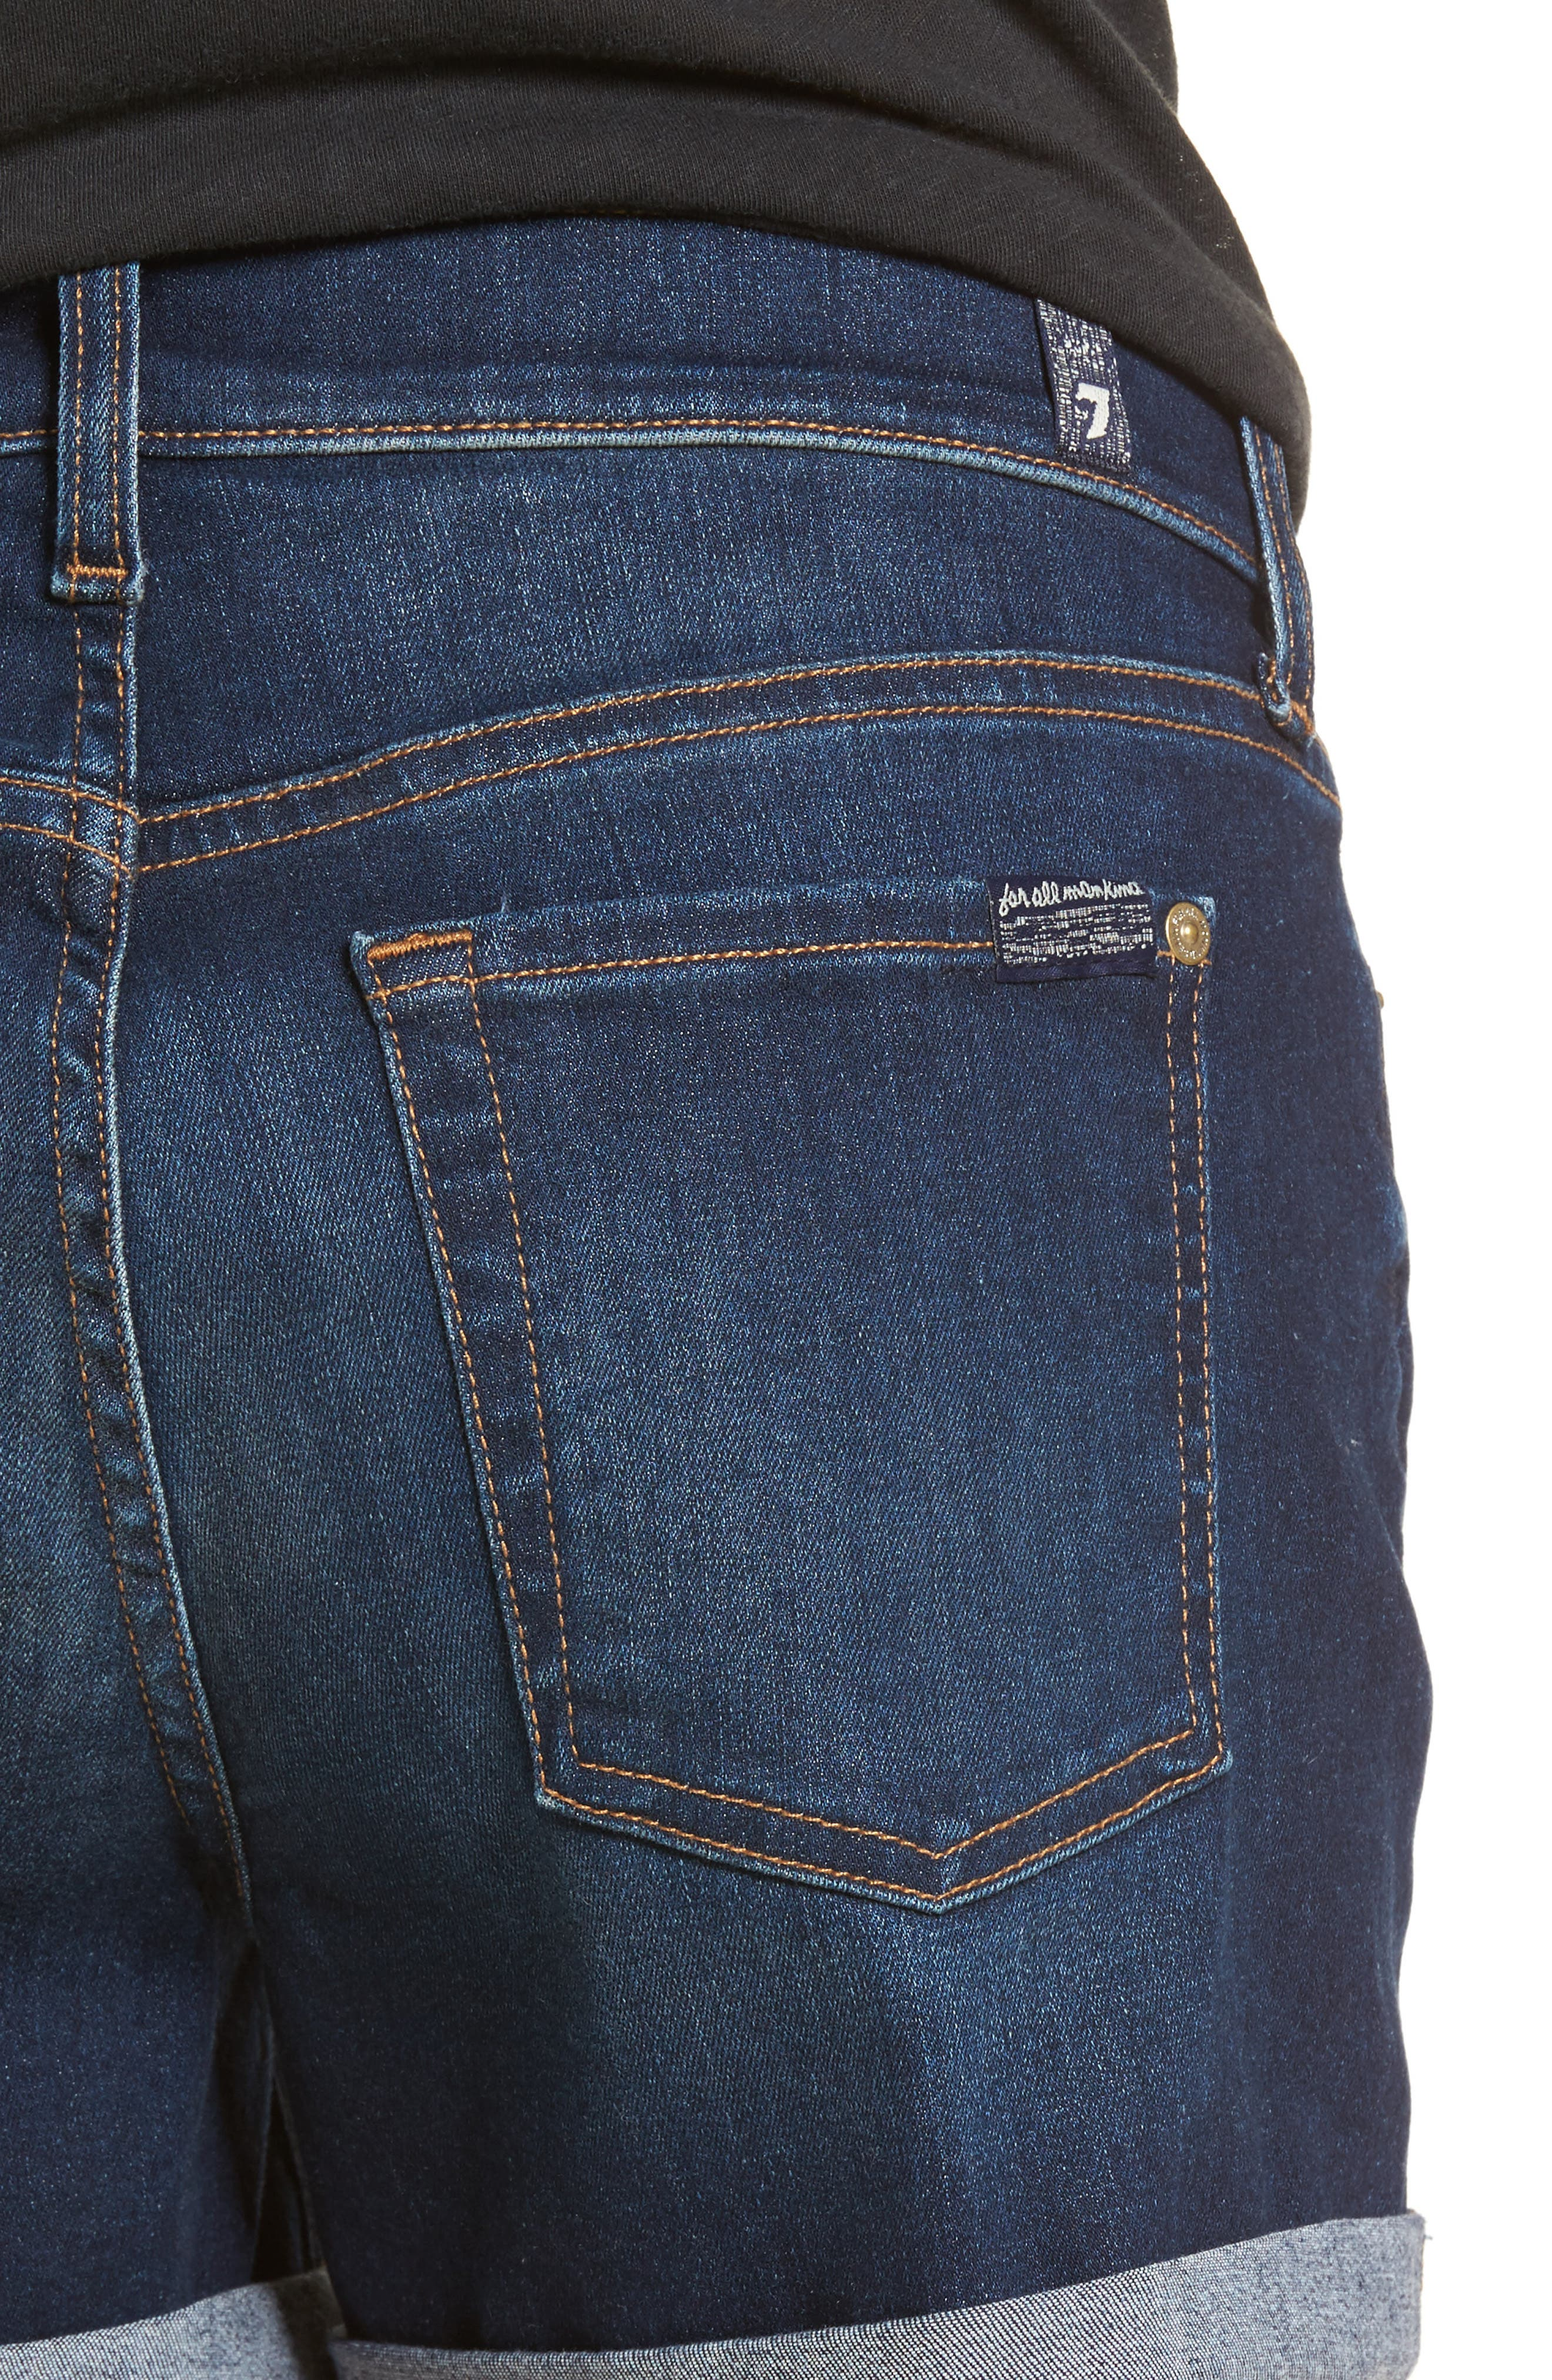 7 FOR ALL MANKIND<SUP>®</SUP>, b(air) Cuffed Denim Shorts, Alternate thumbnail 5, color, MORENO